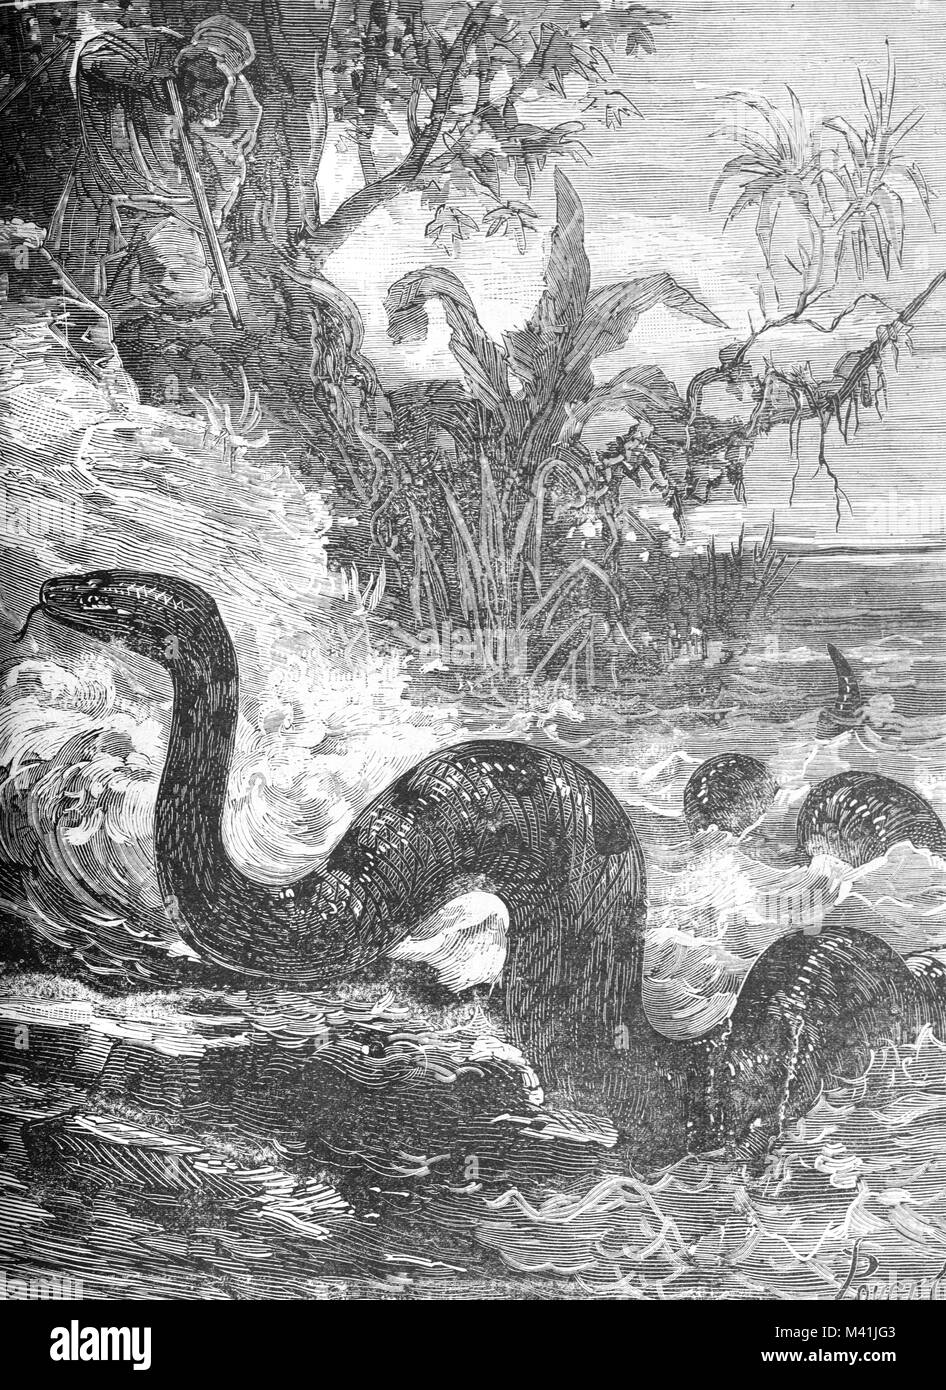 Giant Python, Snake or Lake Monster in Lake Fetzara Algeria (Engraving 1879) - Stock Image